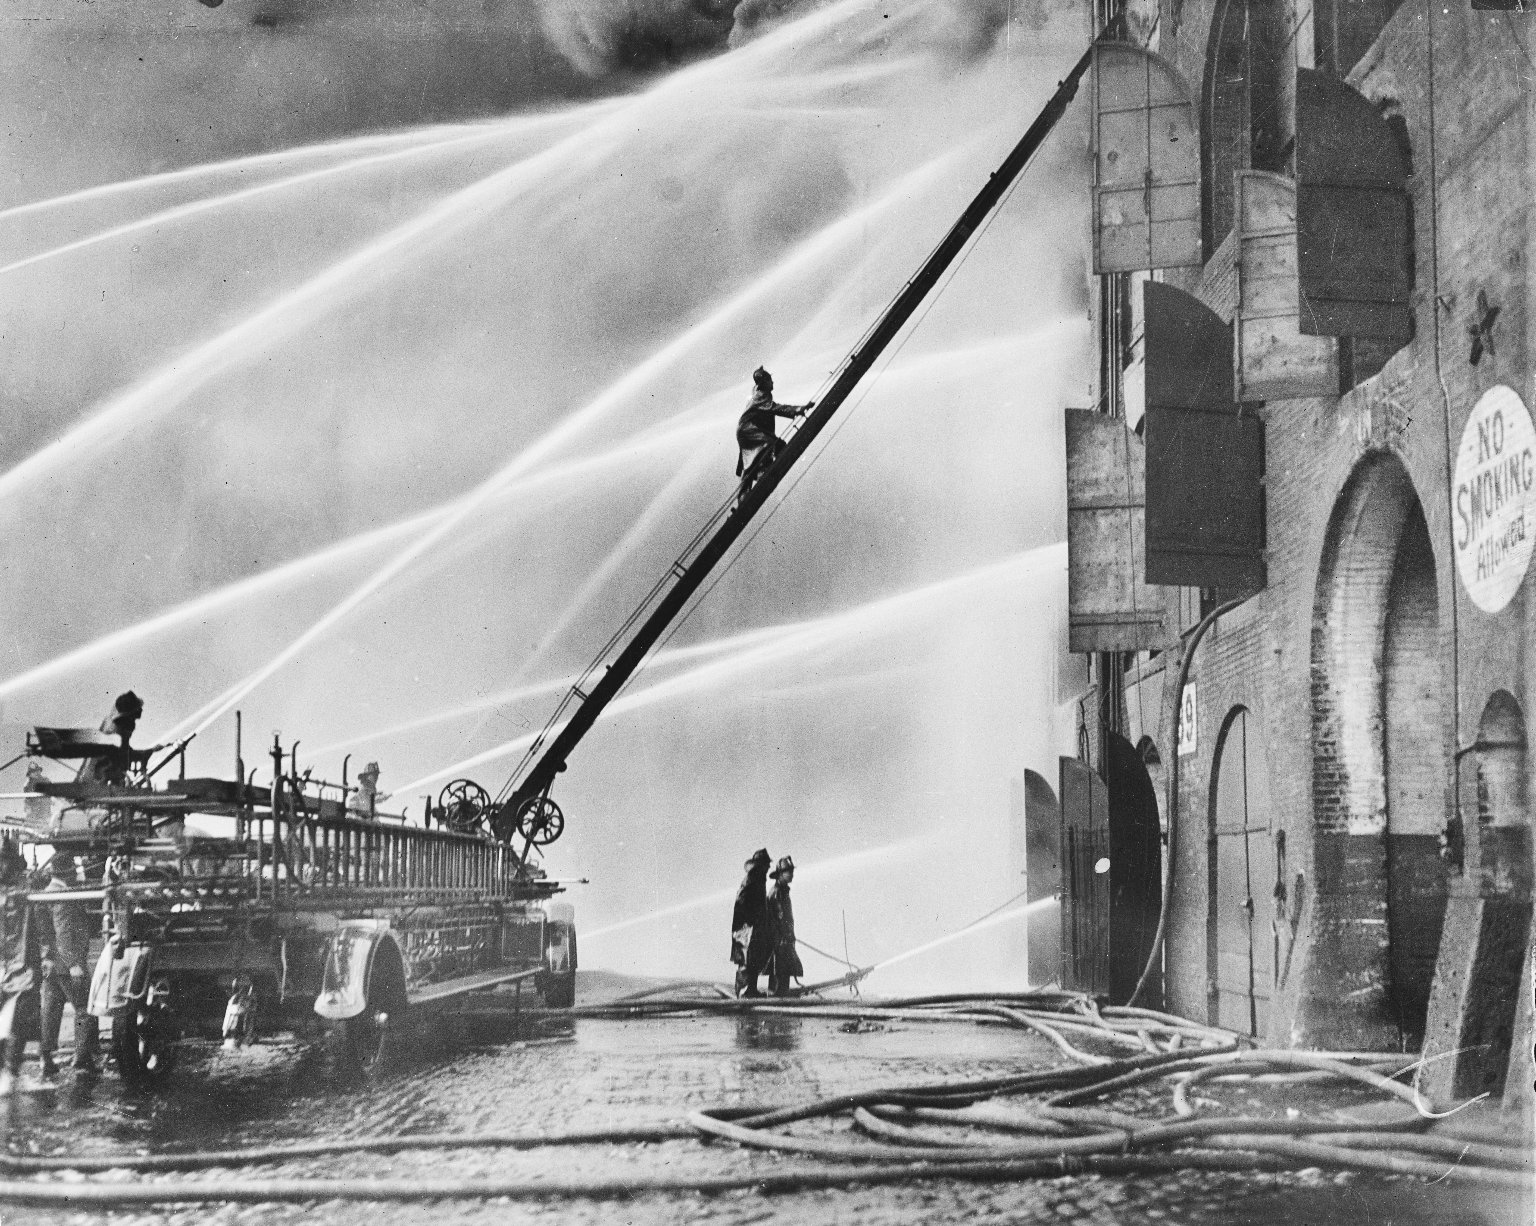 Пожар на складе. Пожарная автолестница American LaFrance. Нью-Йорк, США. Начало 20 века